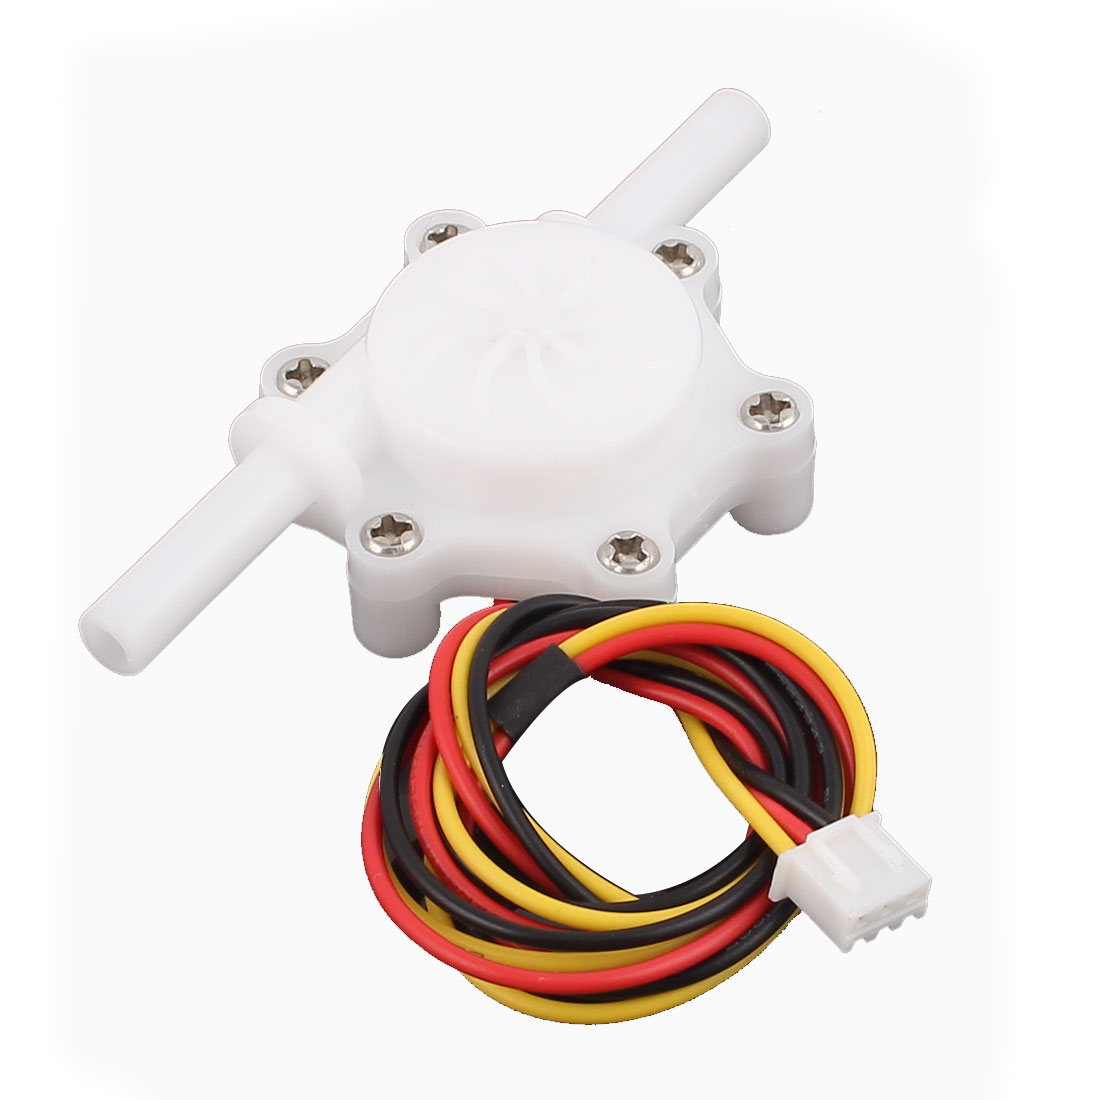 0.3-4.0L/min 6mm Outlet Outer Dia Water Flow Counter Sensor SEN-HZ06K